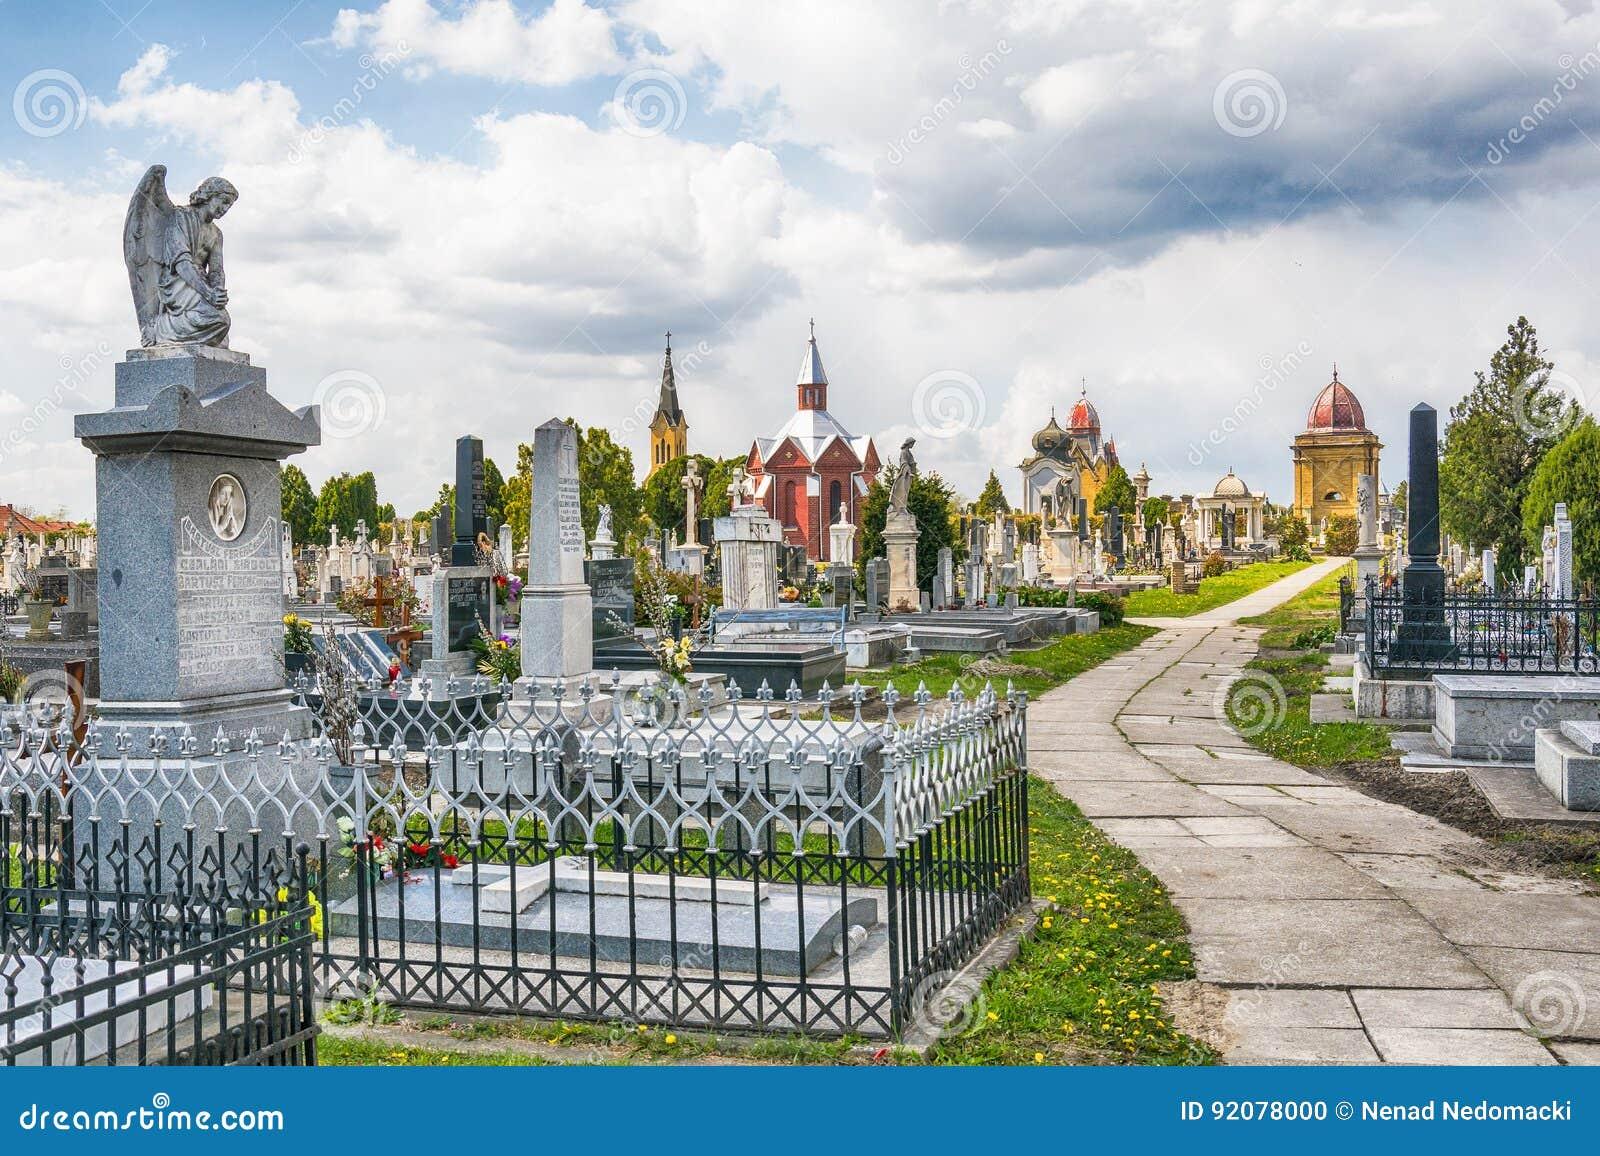 Cemetery/Graveyard In Subotica, Serbia Editorial Image